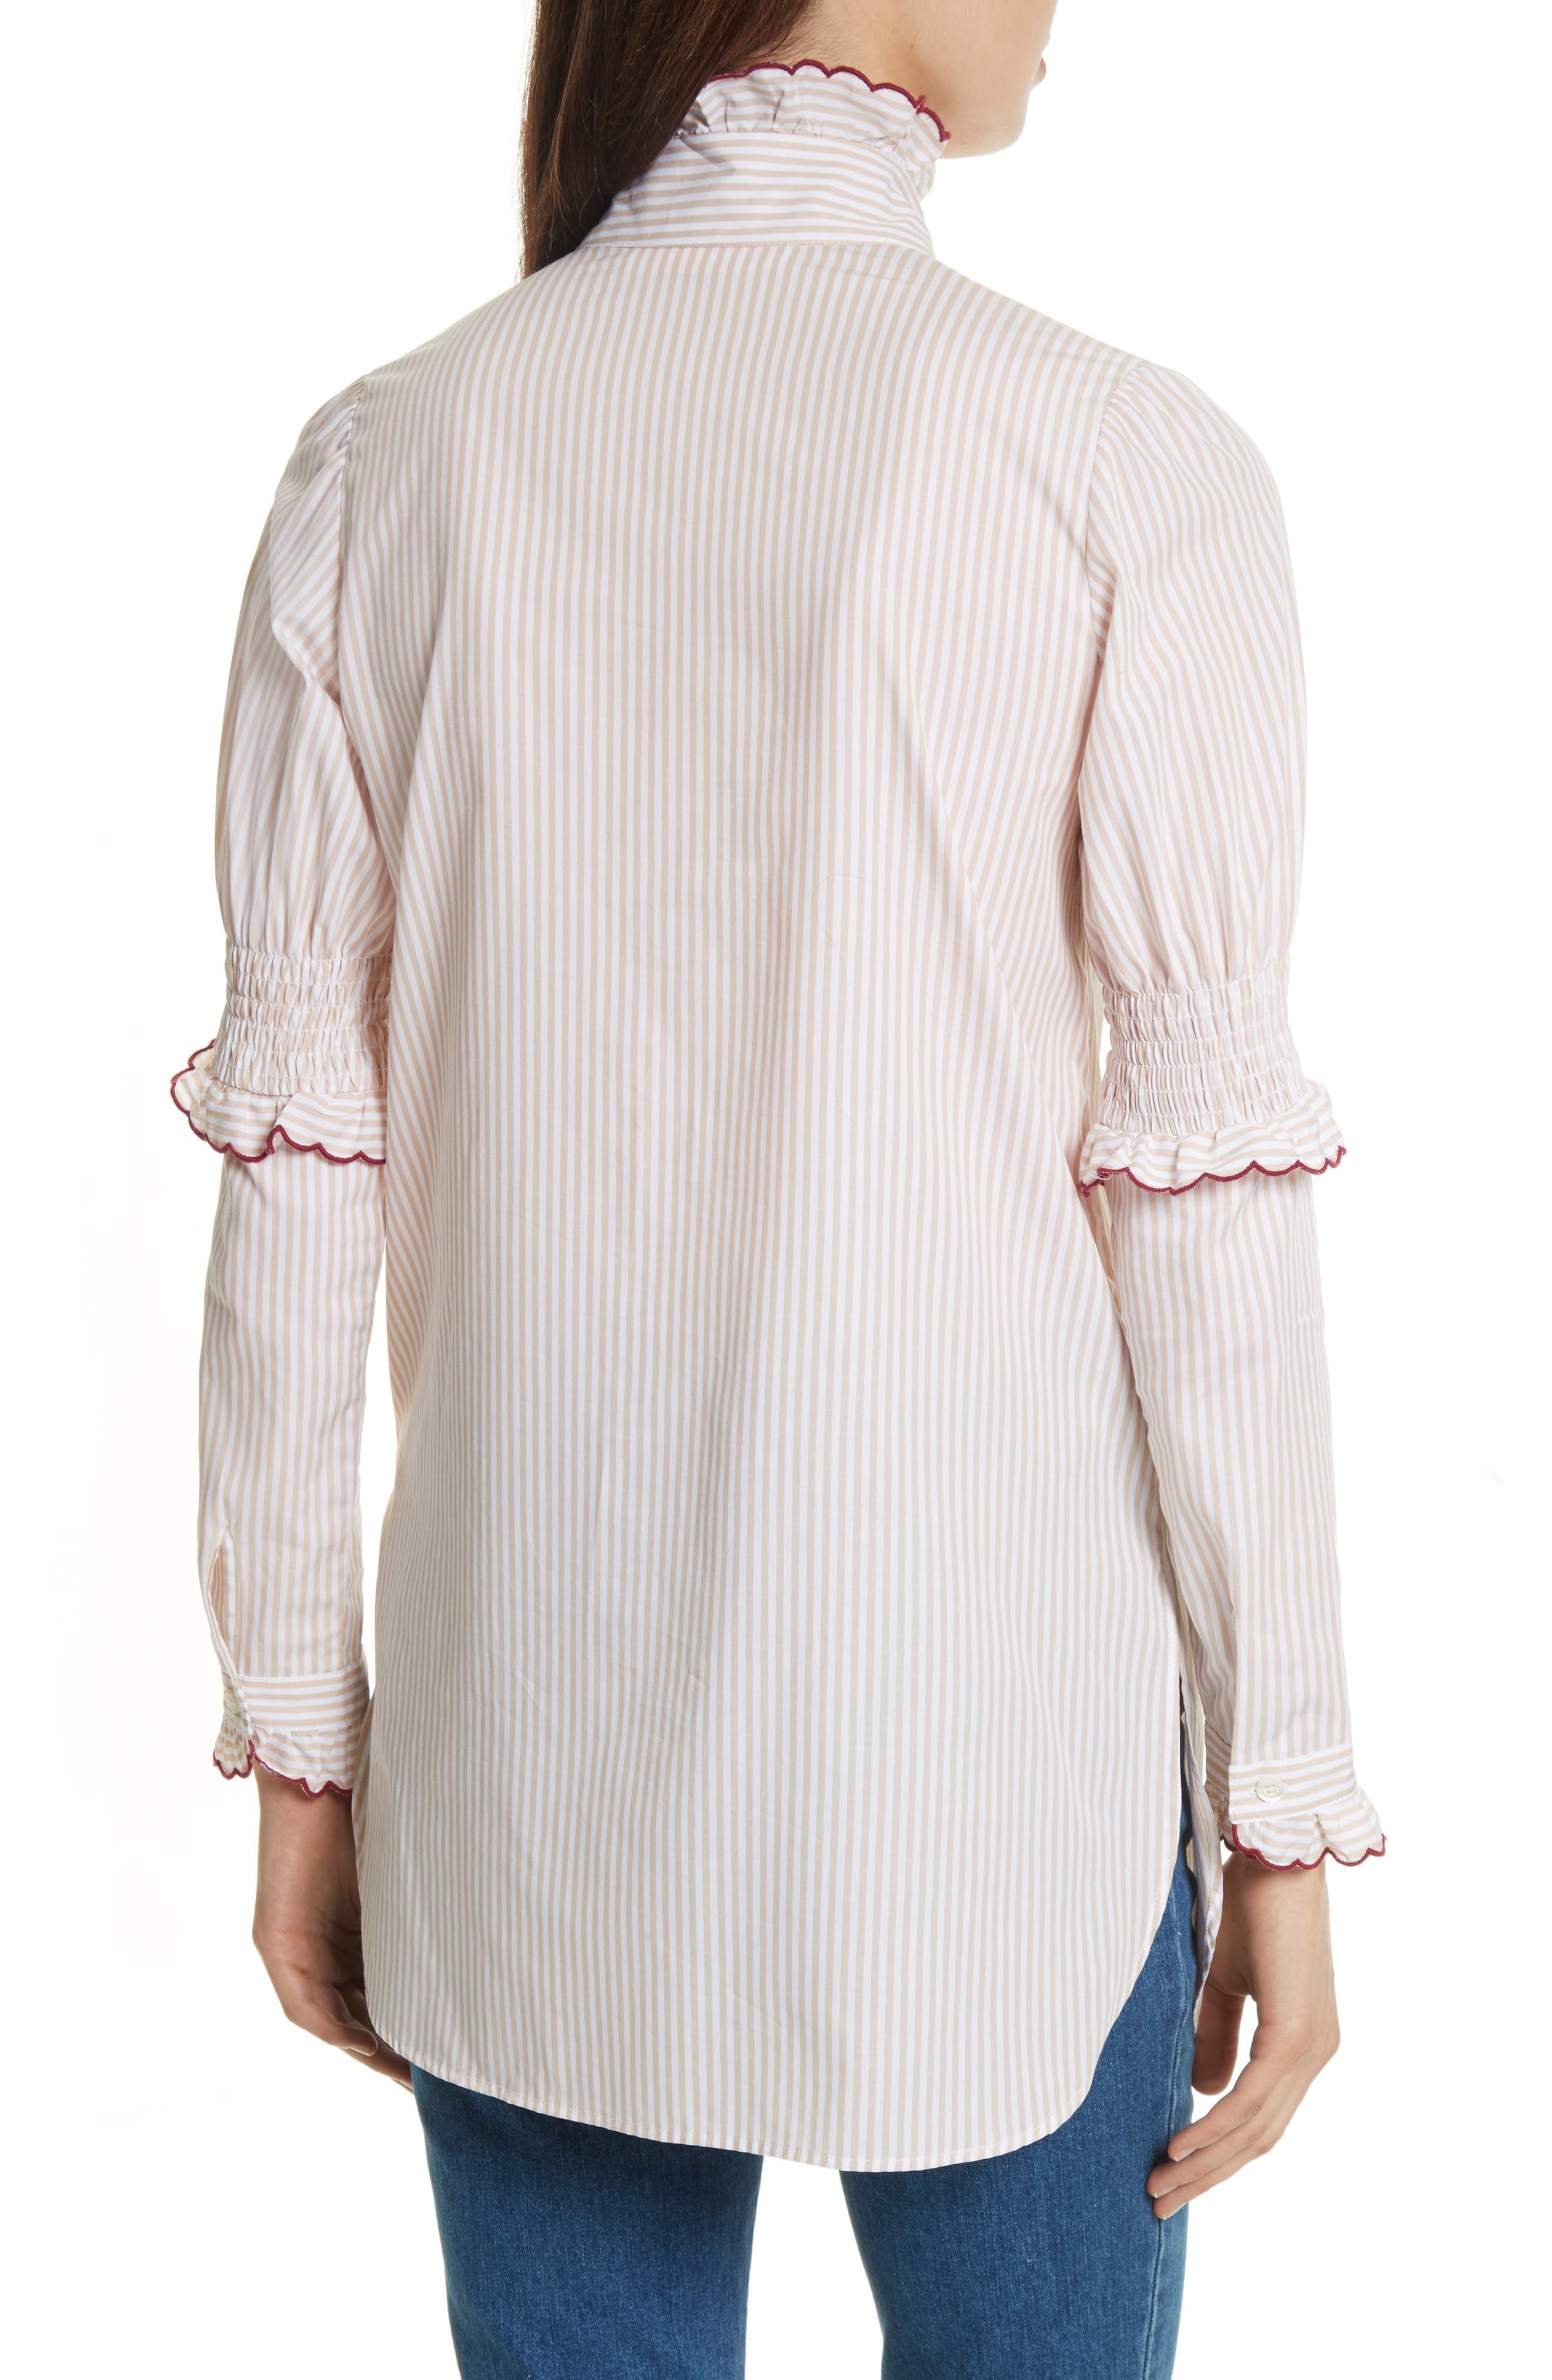 Stripe Cotton Shirt,                             Alternate thumbnail 2, color,                             250